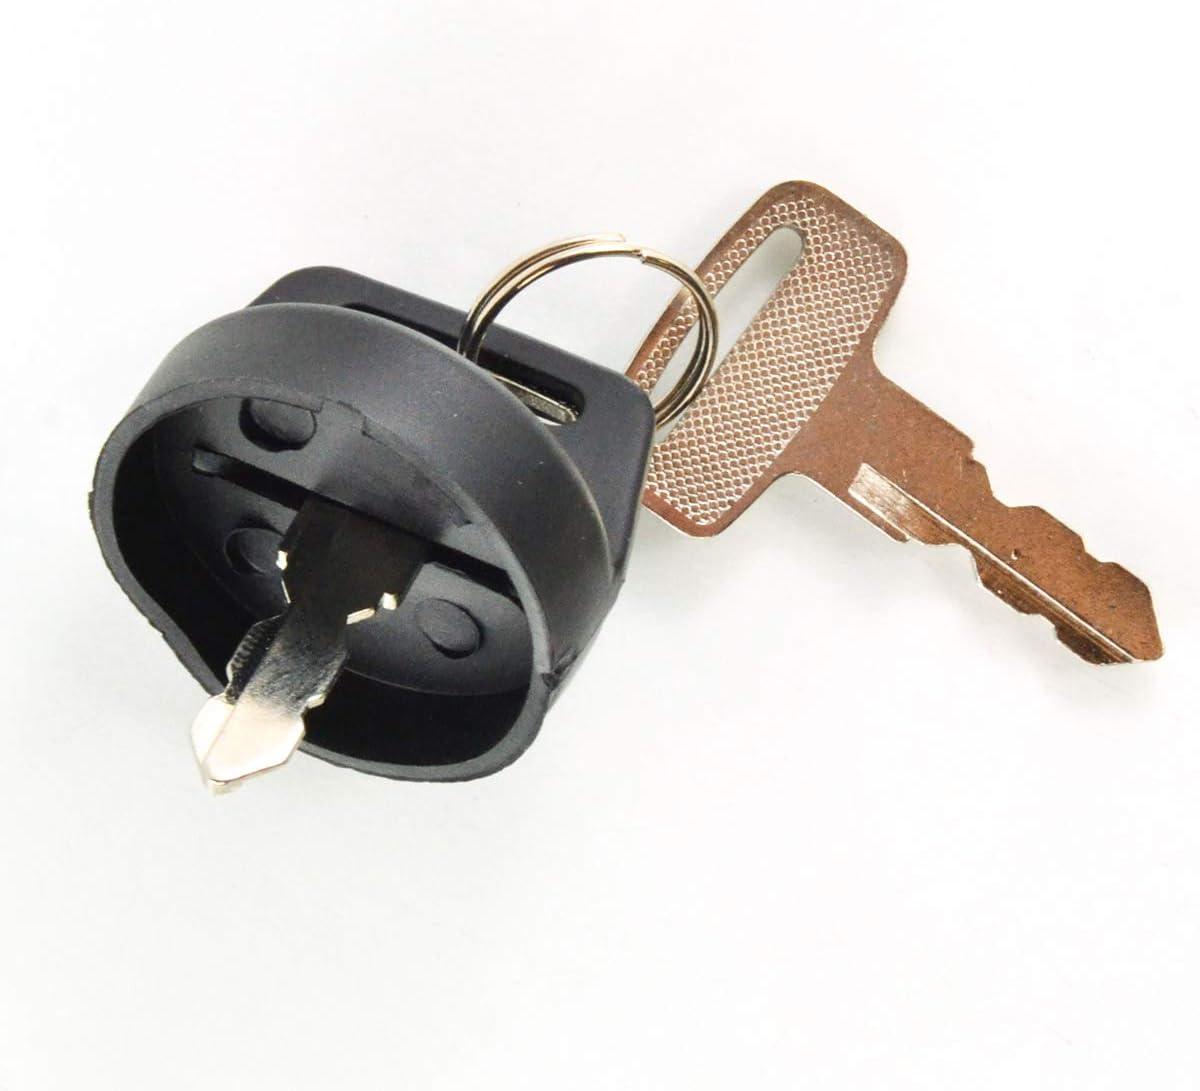 QAZAKY Ignition Key Switch Replacement for Arctic Cat Bearcat M Pantera TZ Z 1 XF ZR Prowler 500 550 650 700 Wildcat Sport 1000 X 4 3000 5000 7000 9000